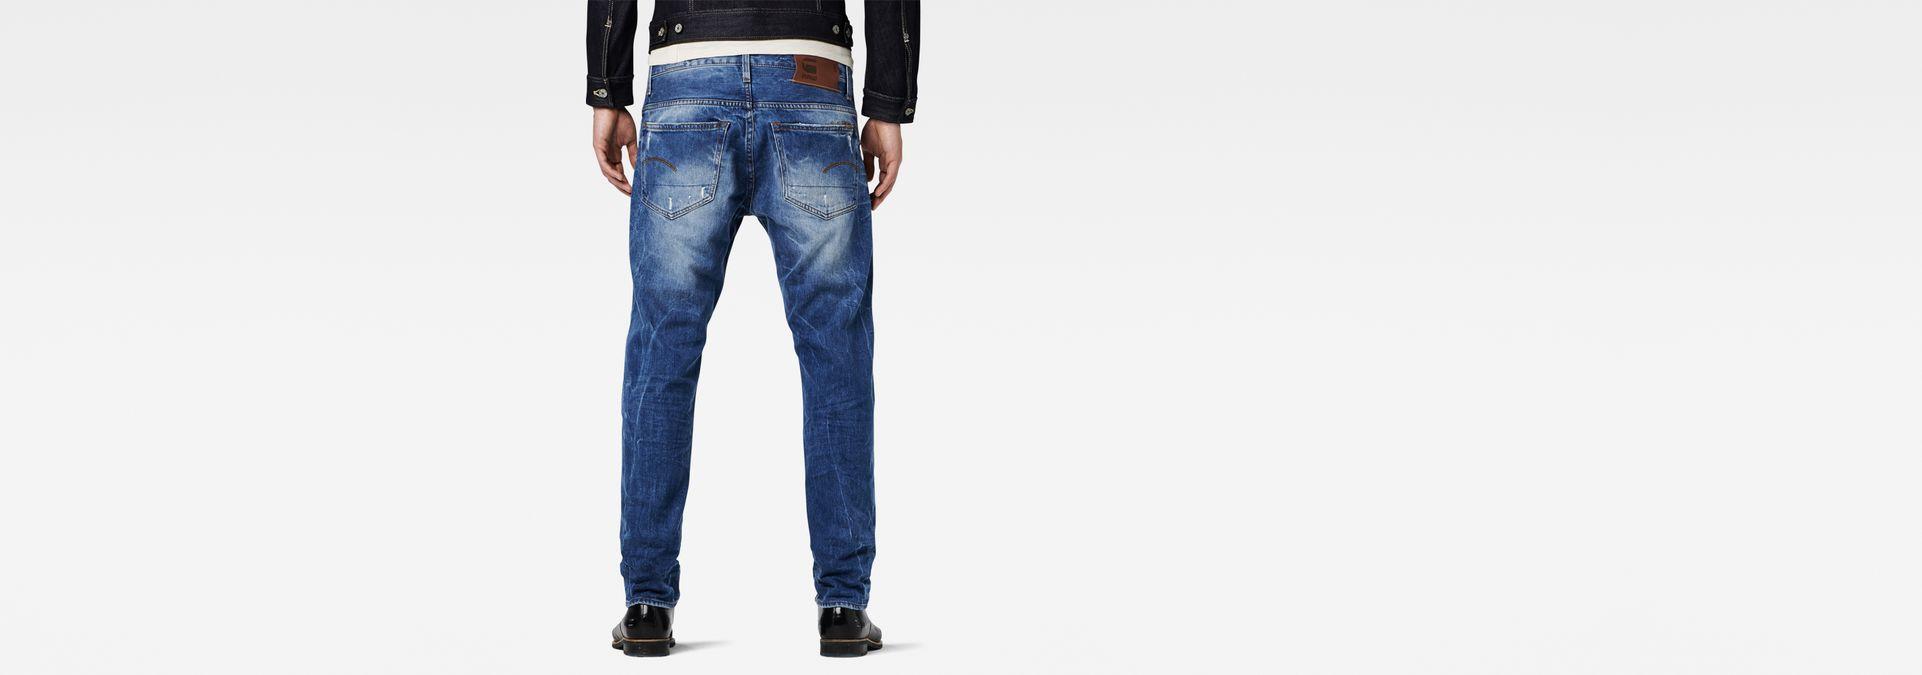 Jeans Homme G star Raw 3301 Straight Lt Aged (wisk Denim